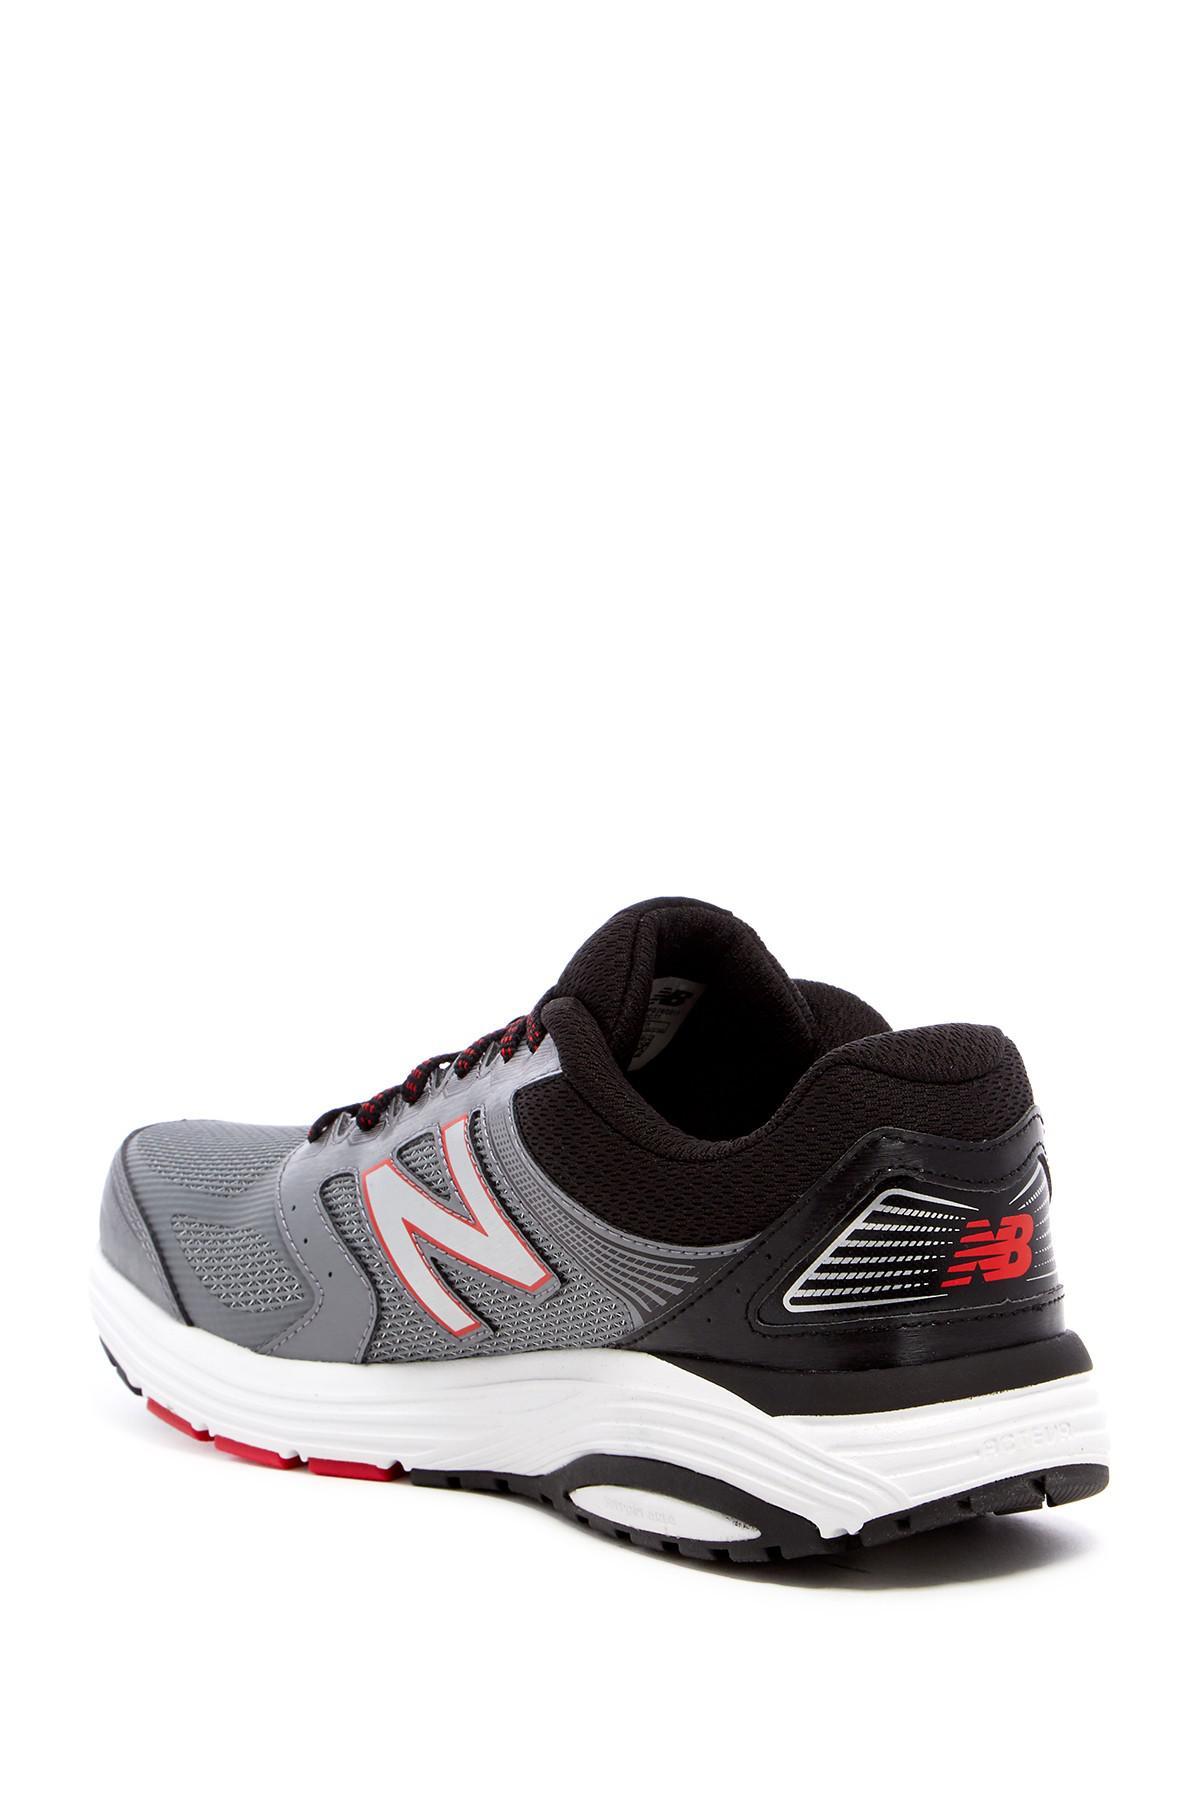 New Balance 1500v4 Running Sneaker - Wide Width Available ko7ALfQJh